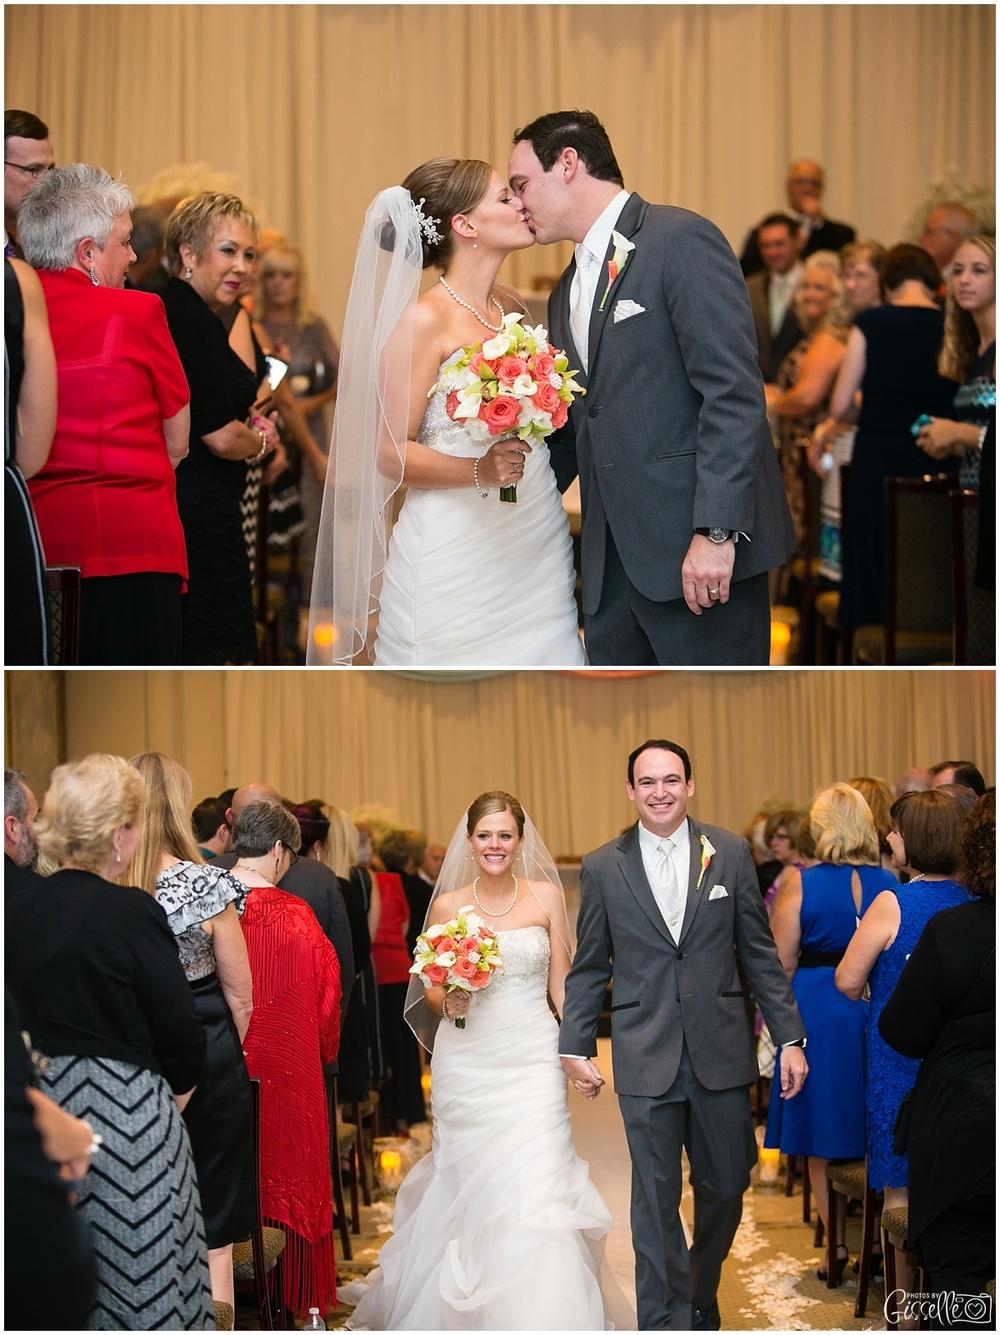 Venutis_Banquets_Addison_Wedding017.jpg